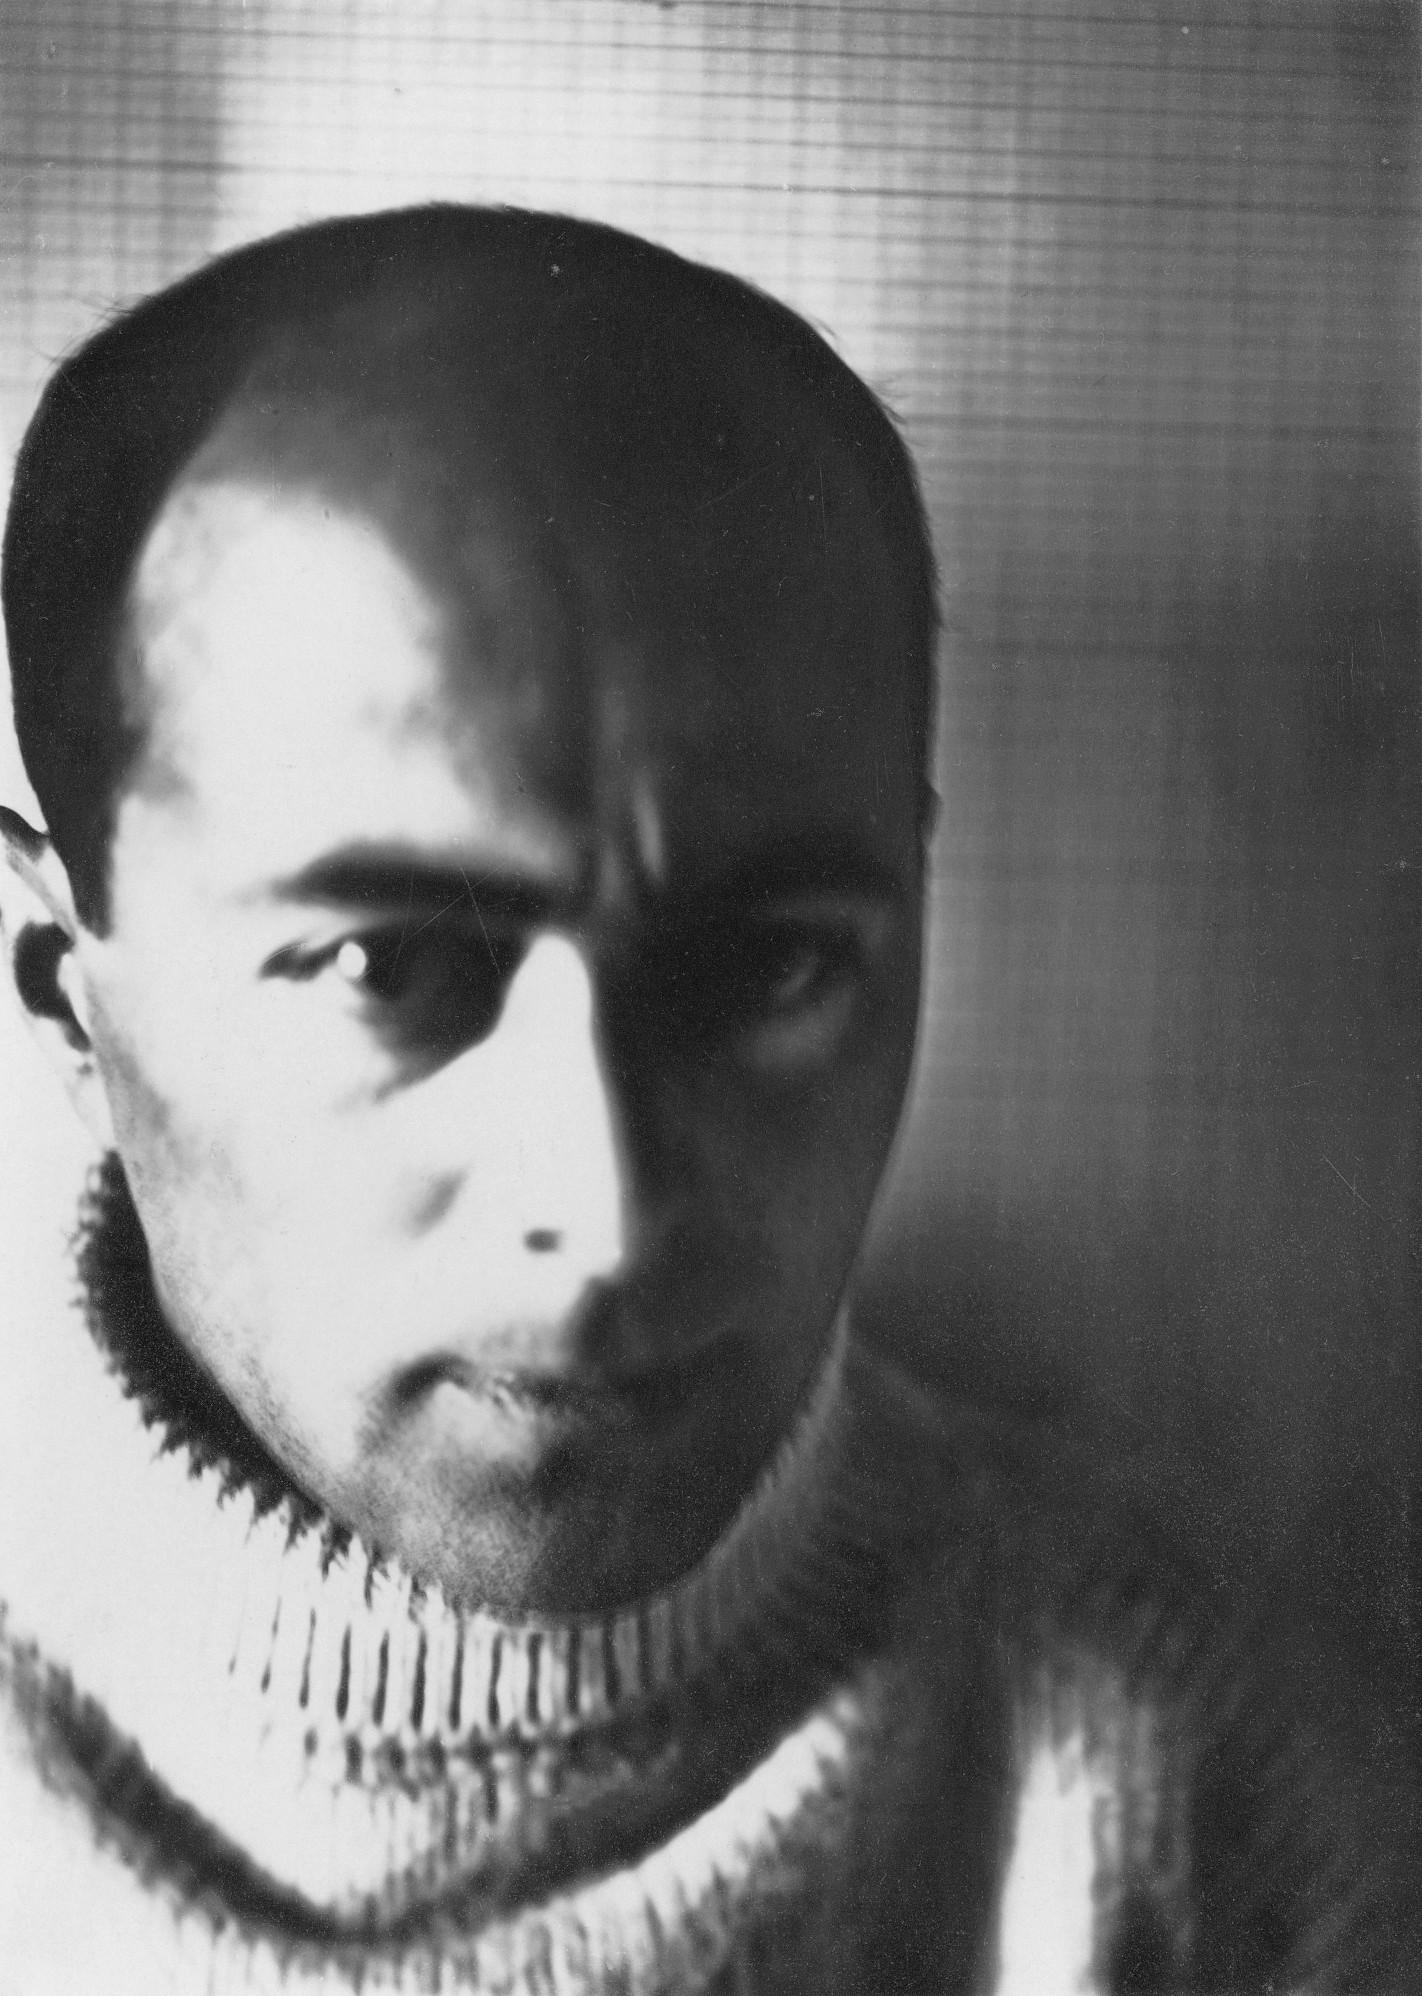 Selbstportrait El Lissitzky, 1924